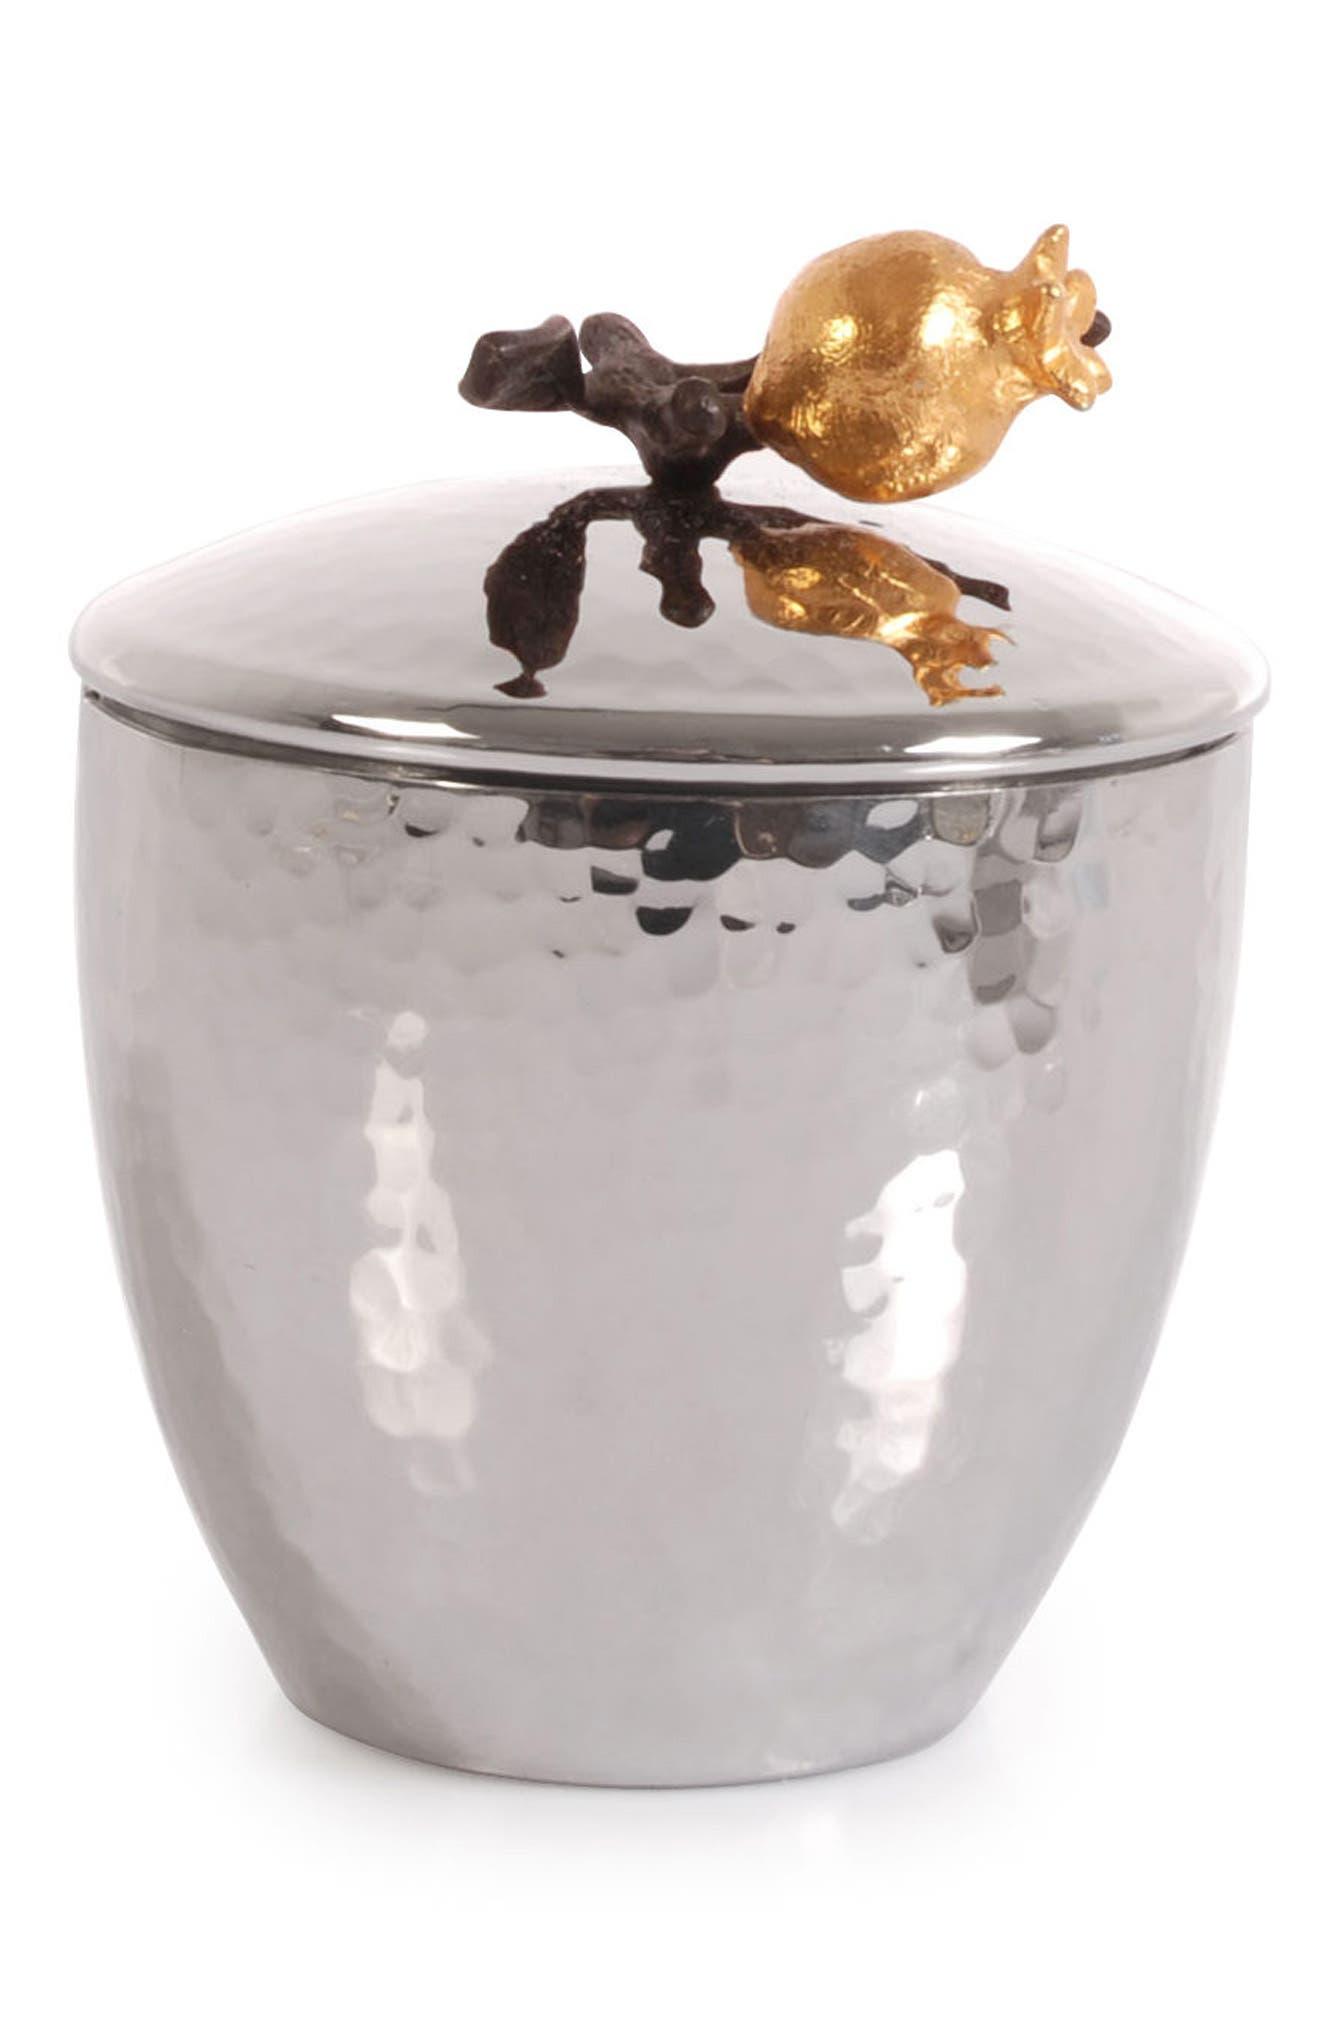 Michael Aram Pomegranate Sugar Bowl & Spoon